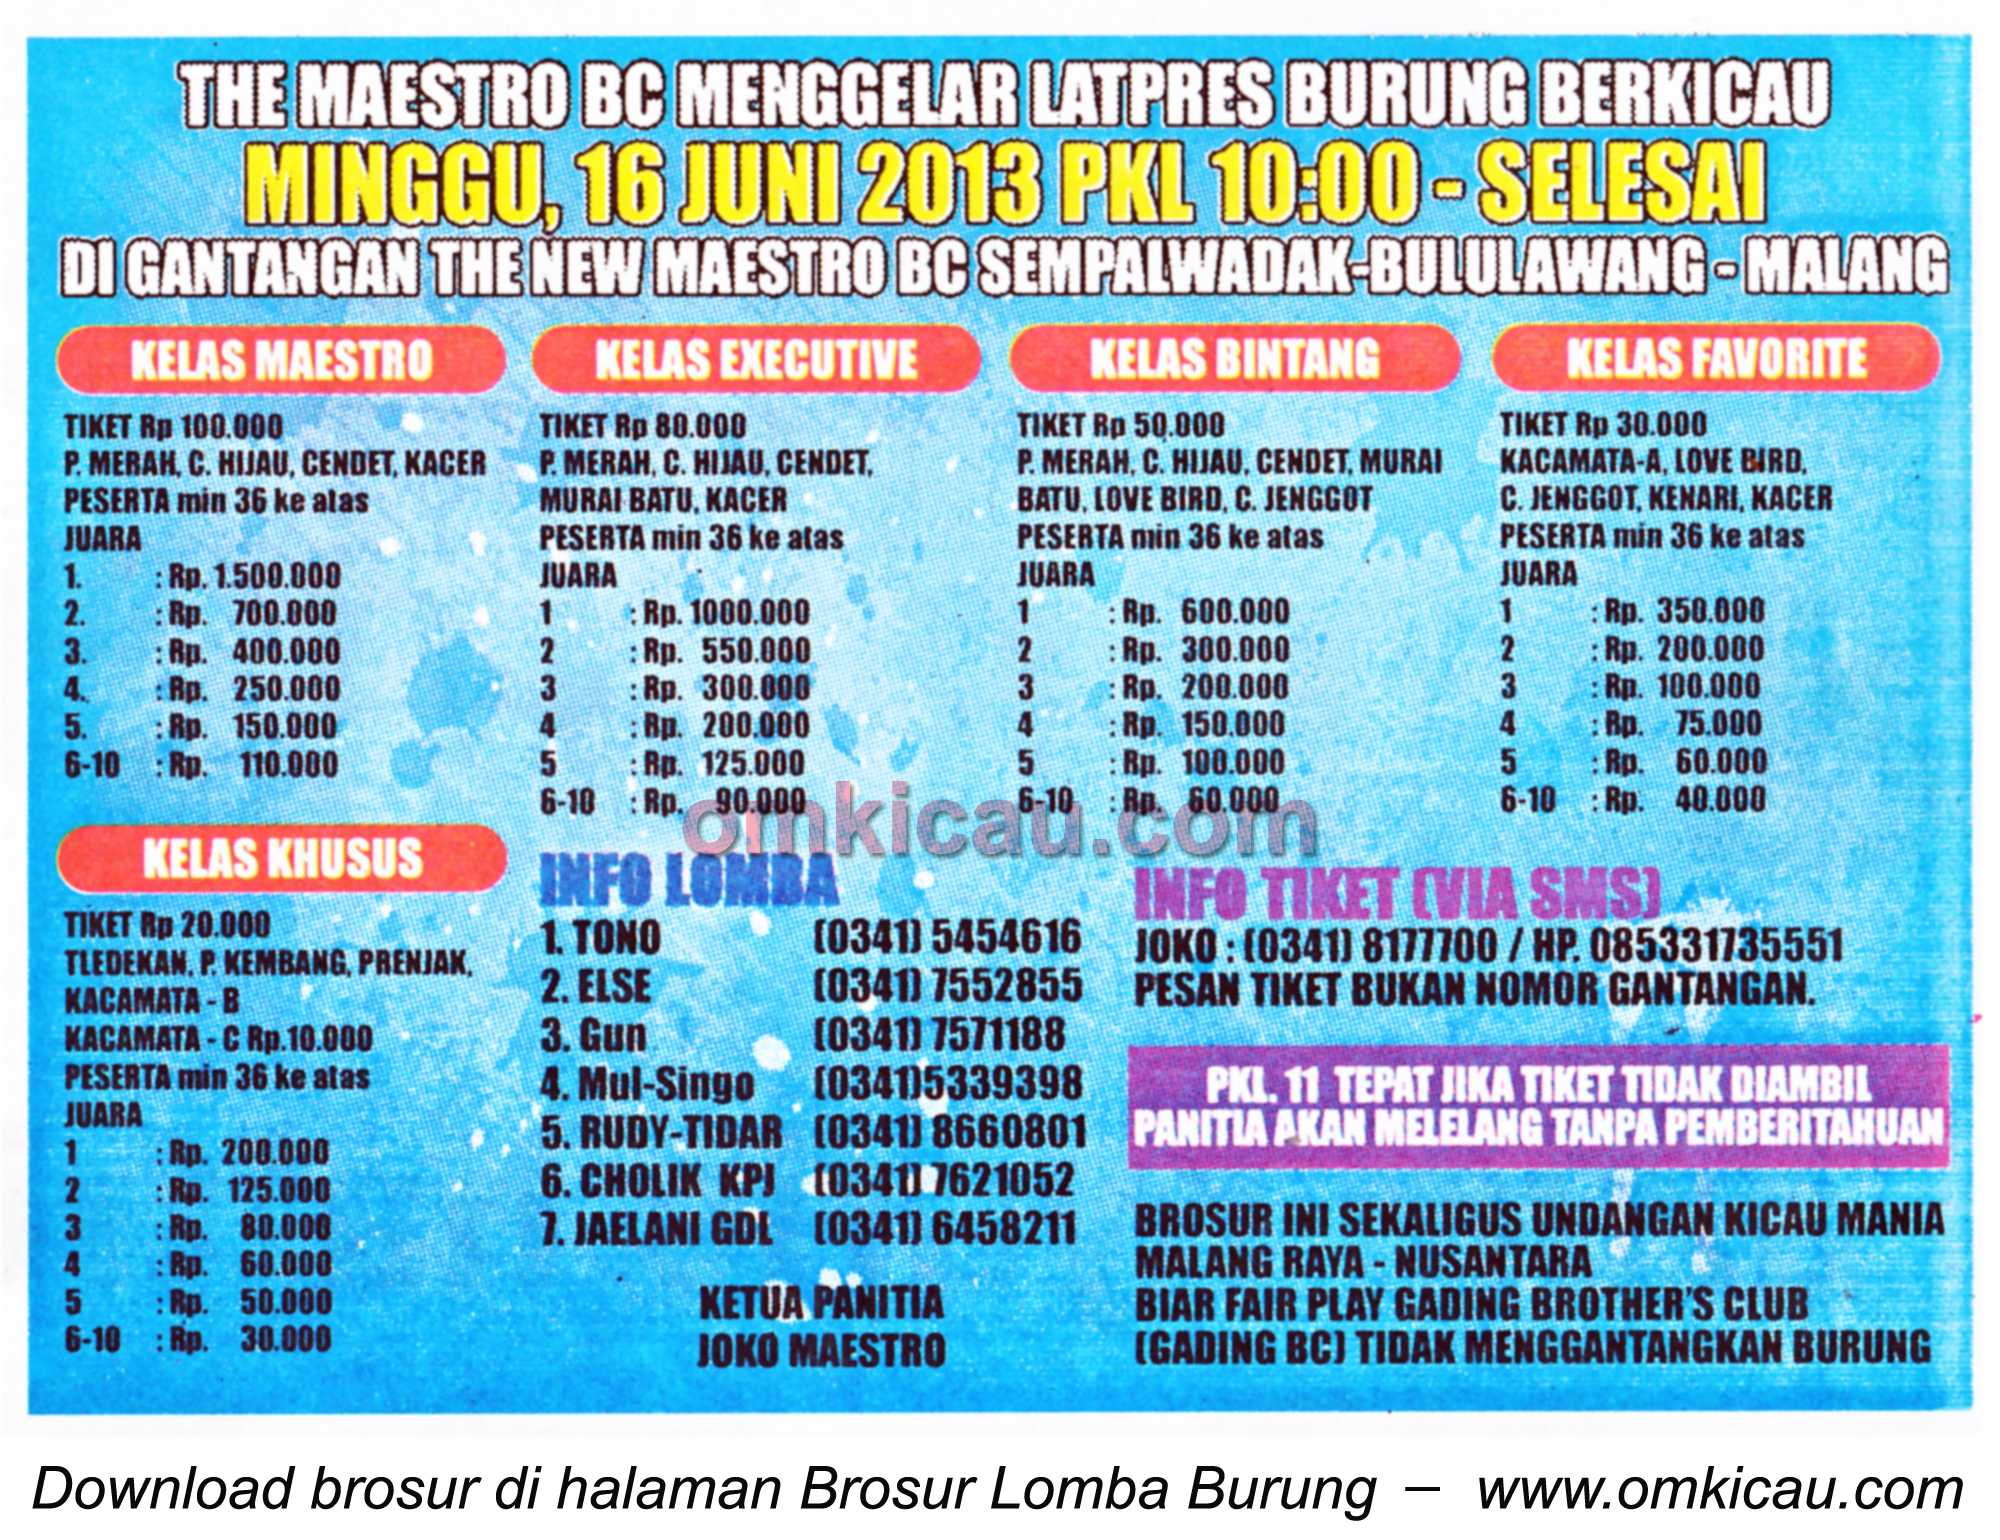 Brosur Latpres Maestro BC Malang - 16 Juni 2013